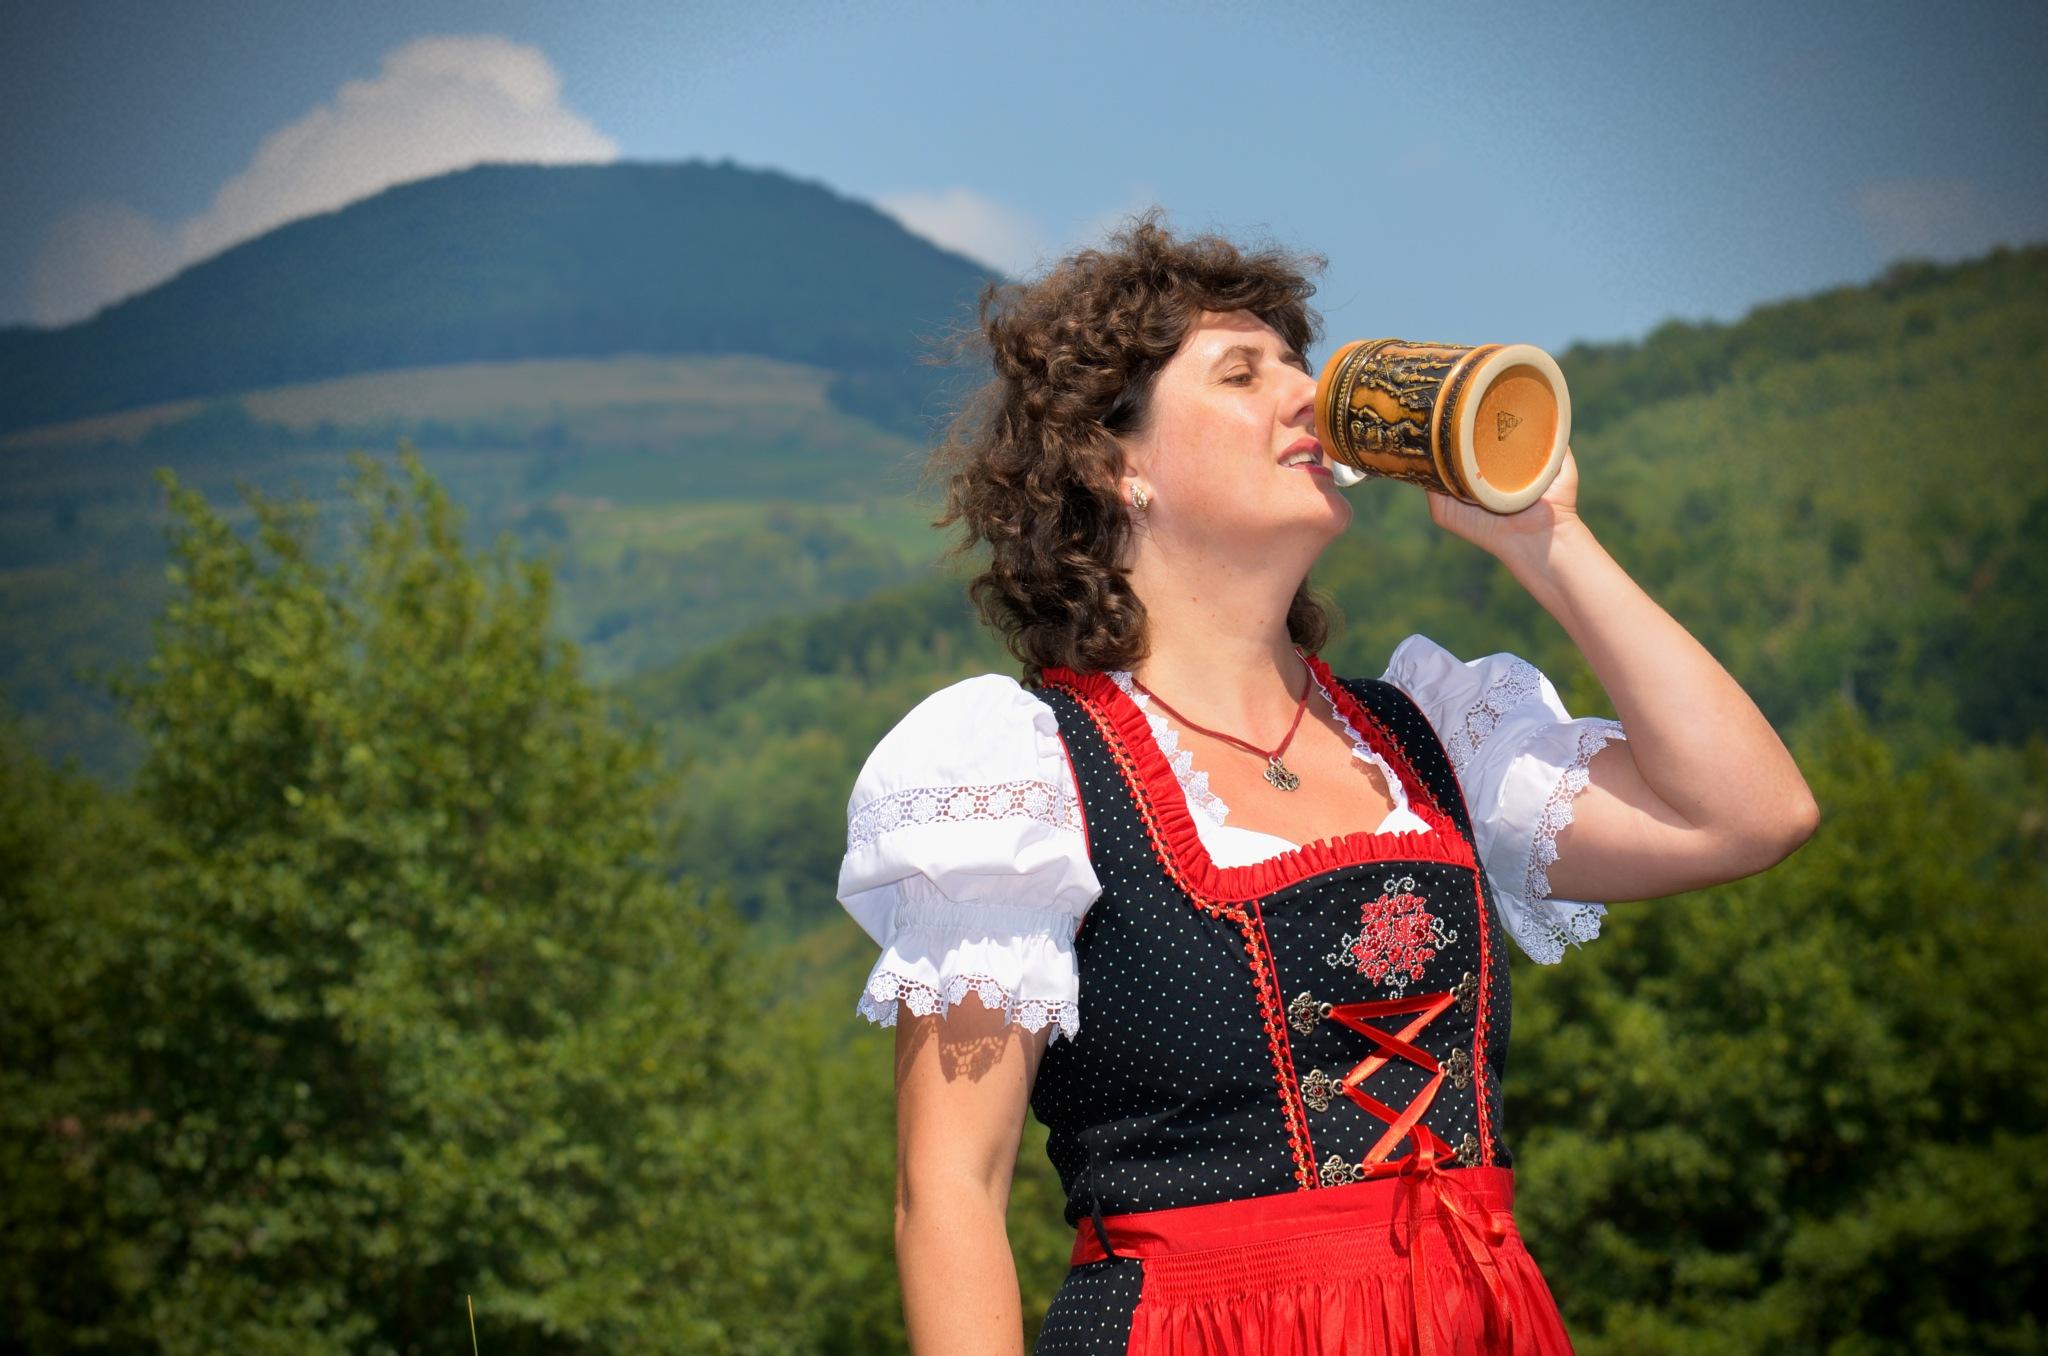 Enjoying the beer like a Bavarian lady by Z_e_n_o